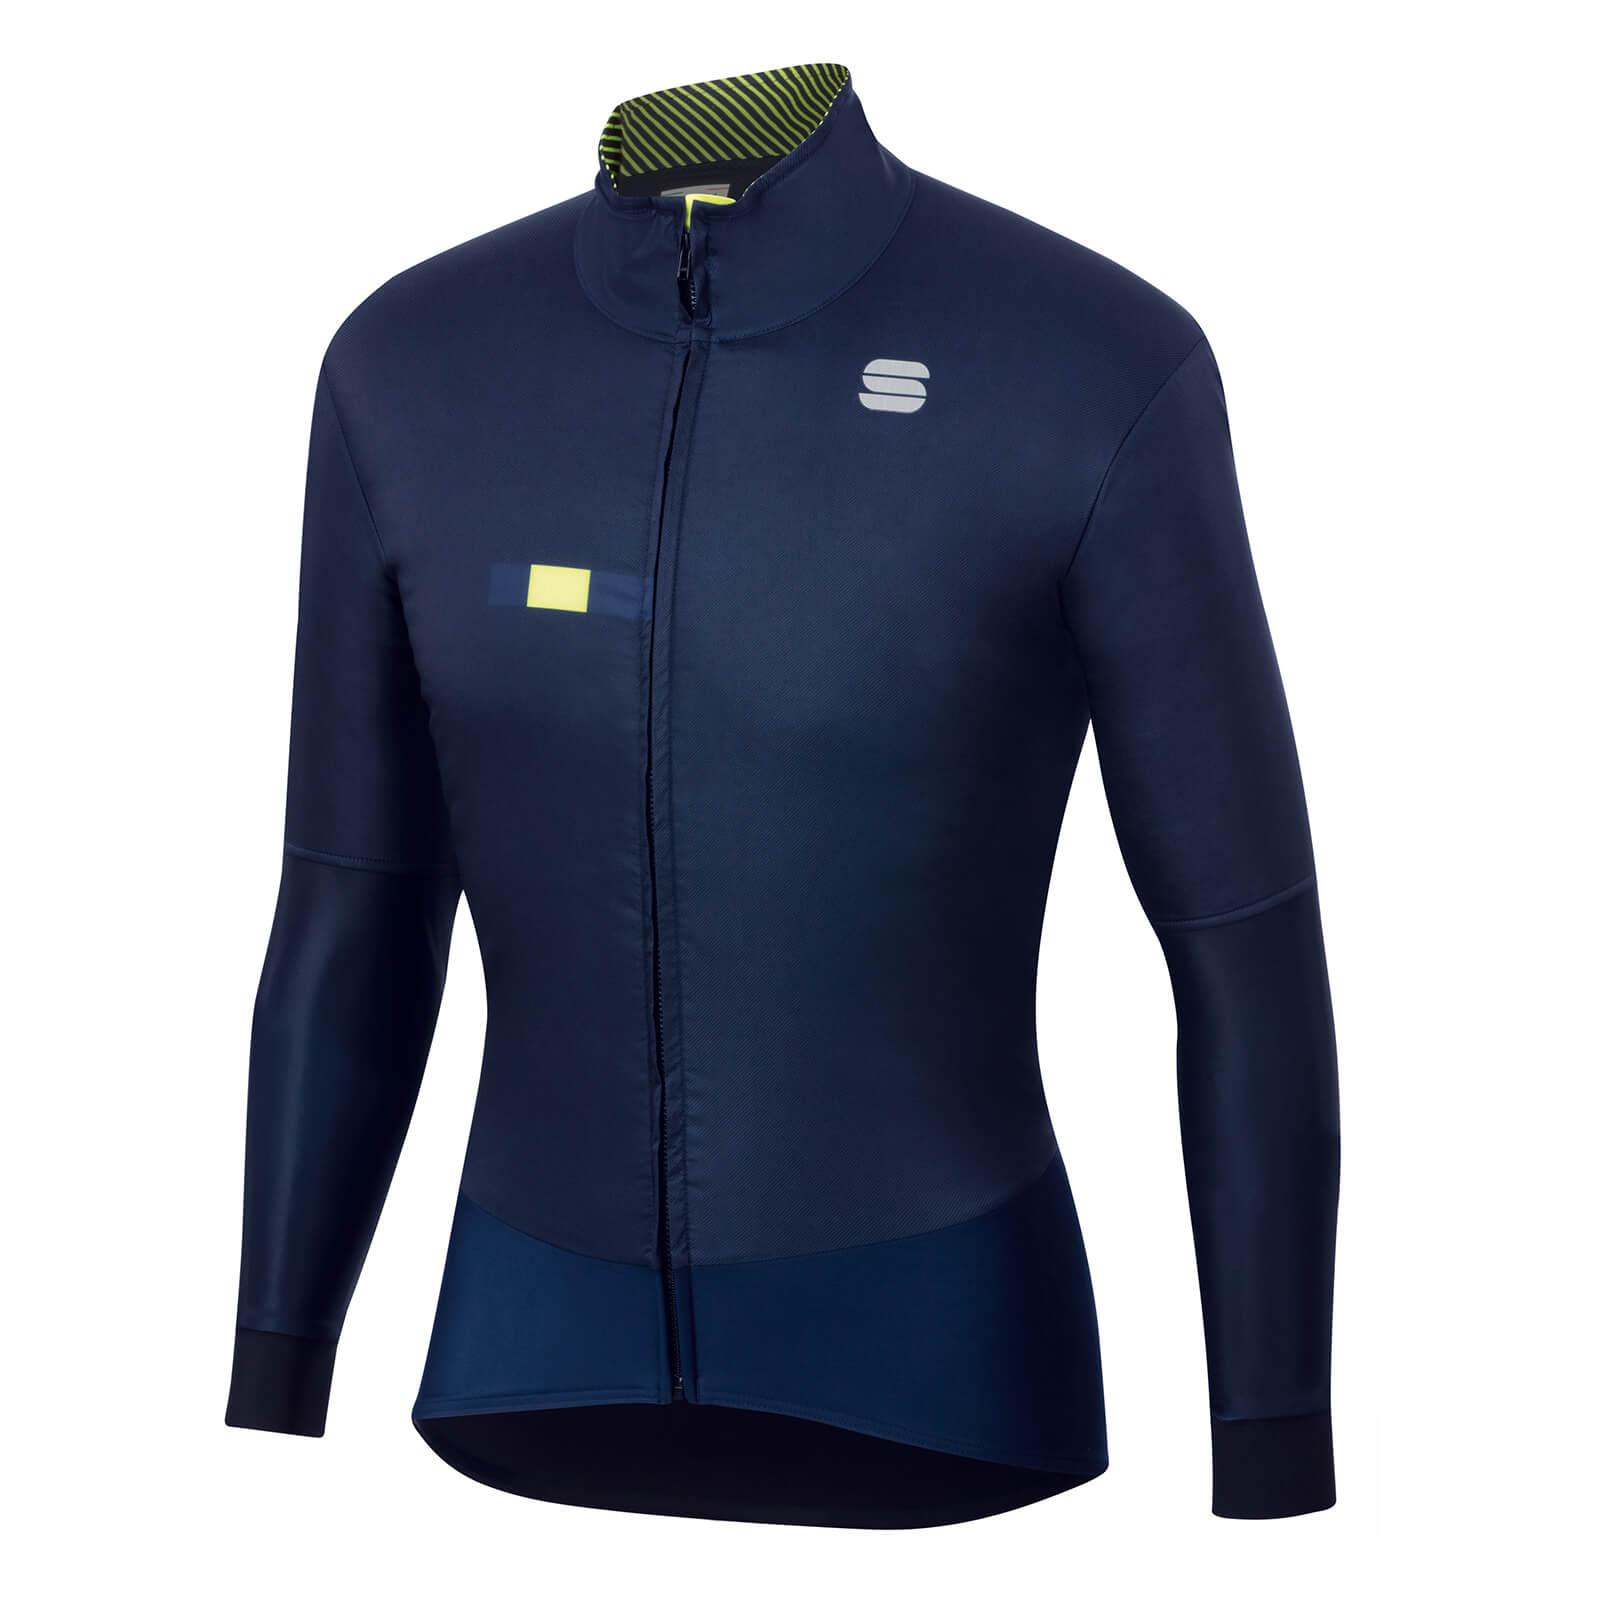 Sportful Bodyfit Pro Jacket - XXL - Blue/Yellow Fluo